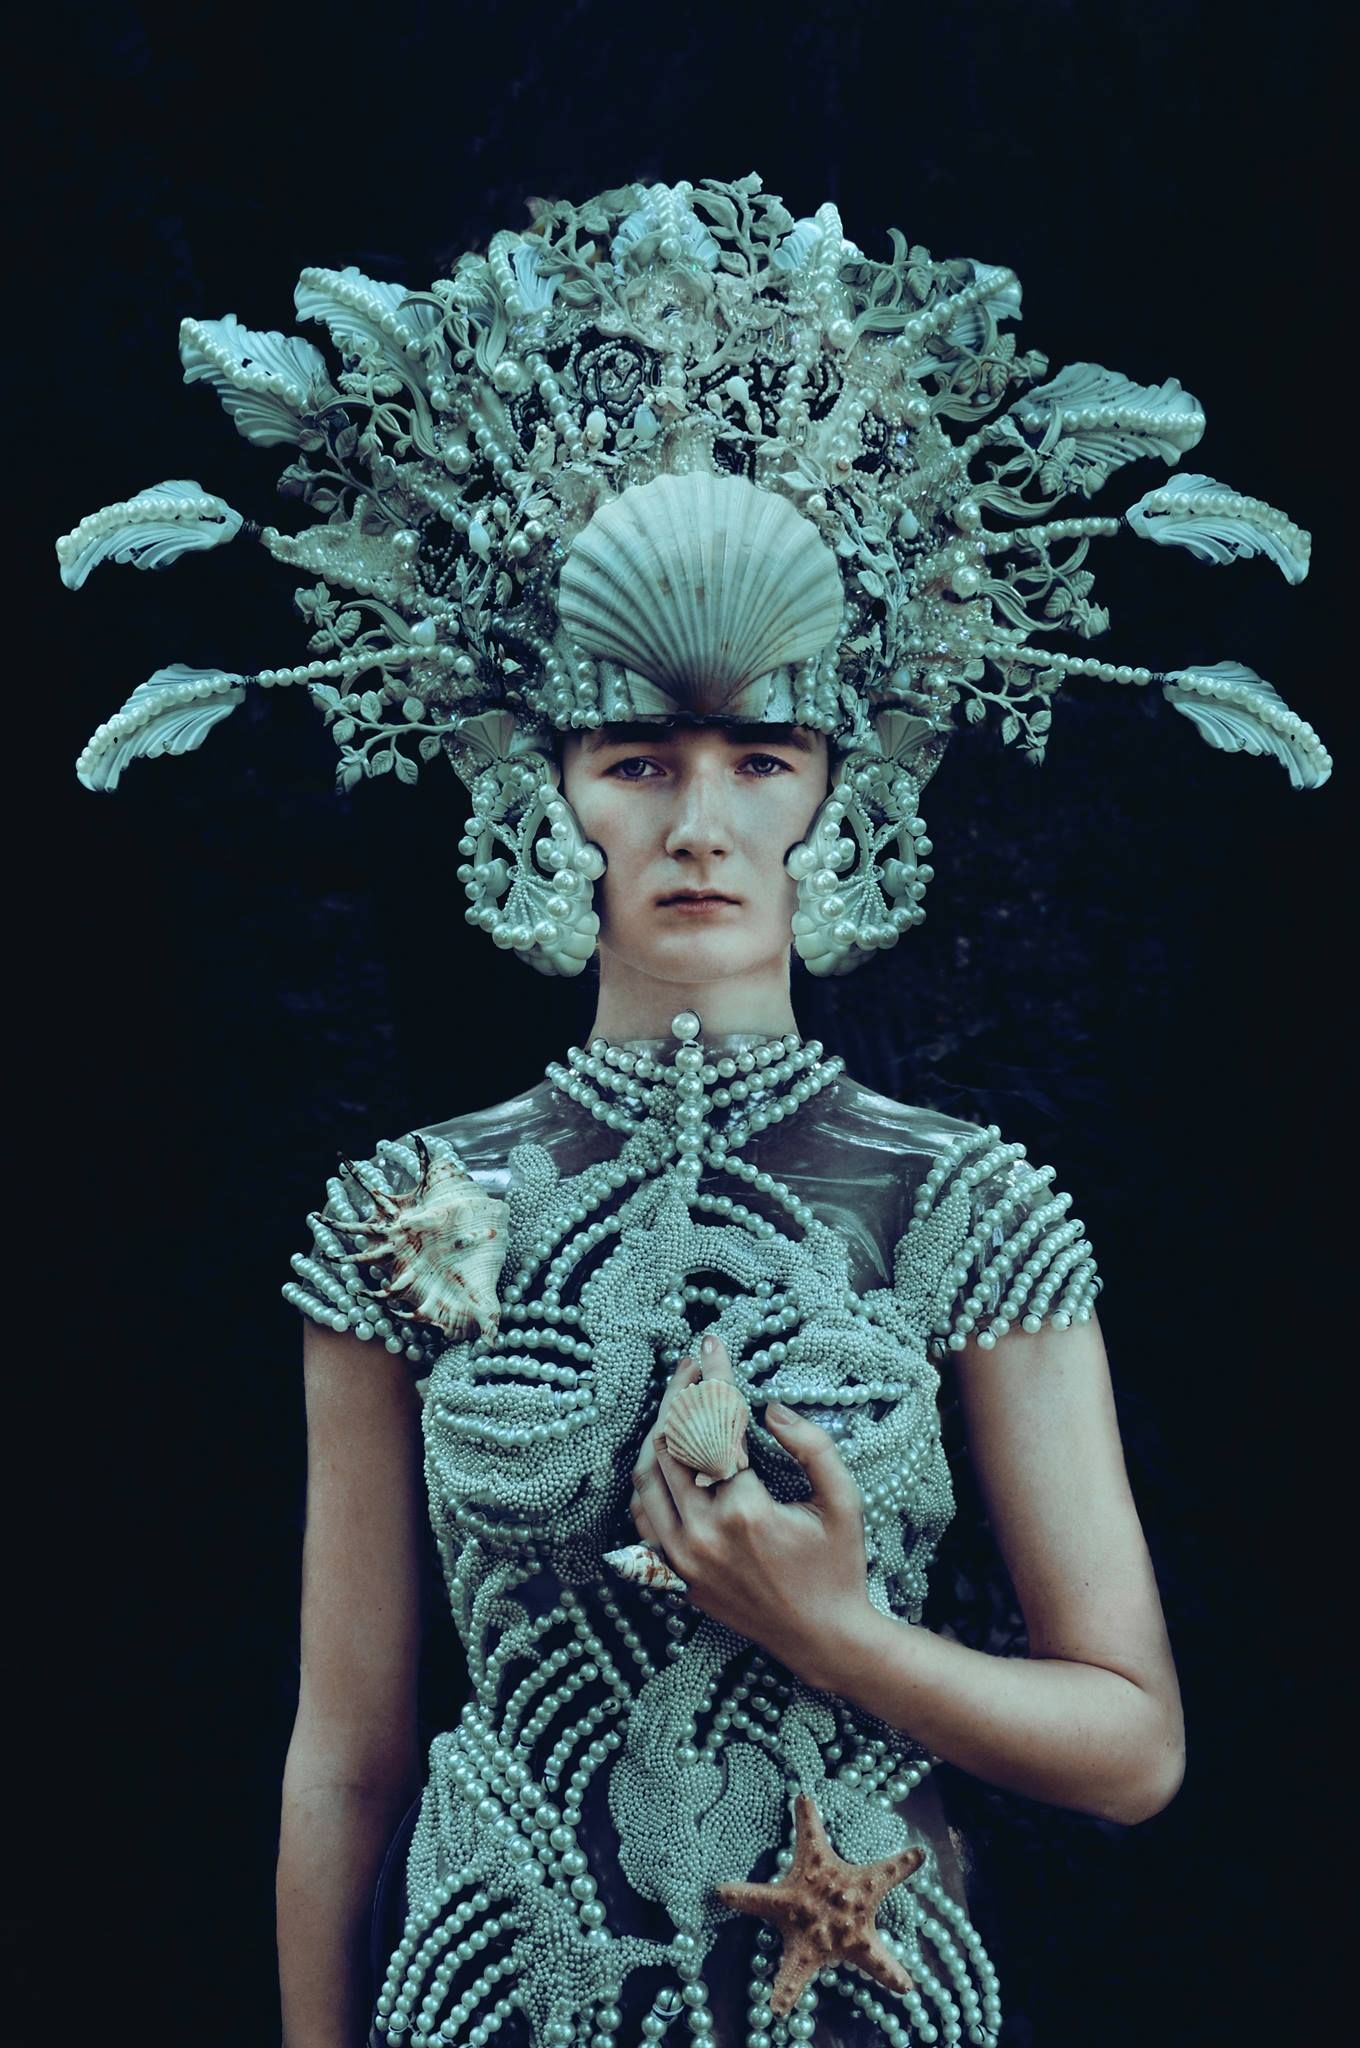 Marcin Nagraba - Photography & Art  https://www.facebook.com/Marcin-Nagraba-Photography-Art-194284147274495/?fref=photo